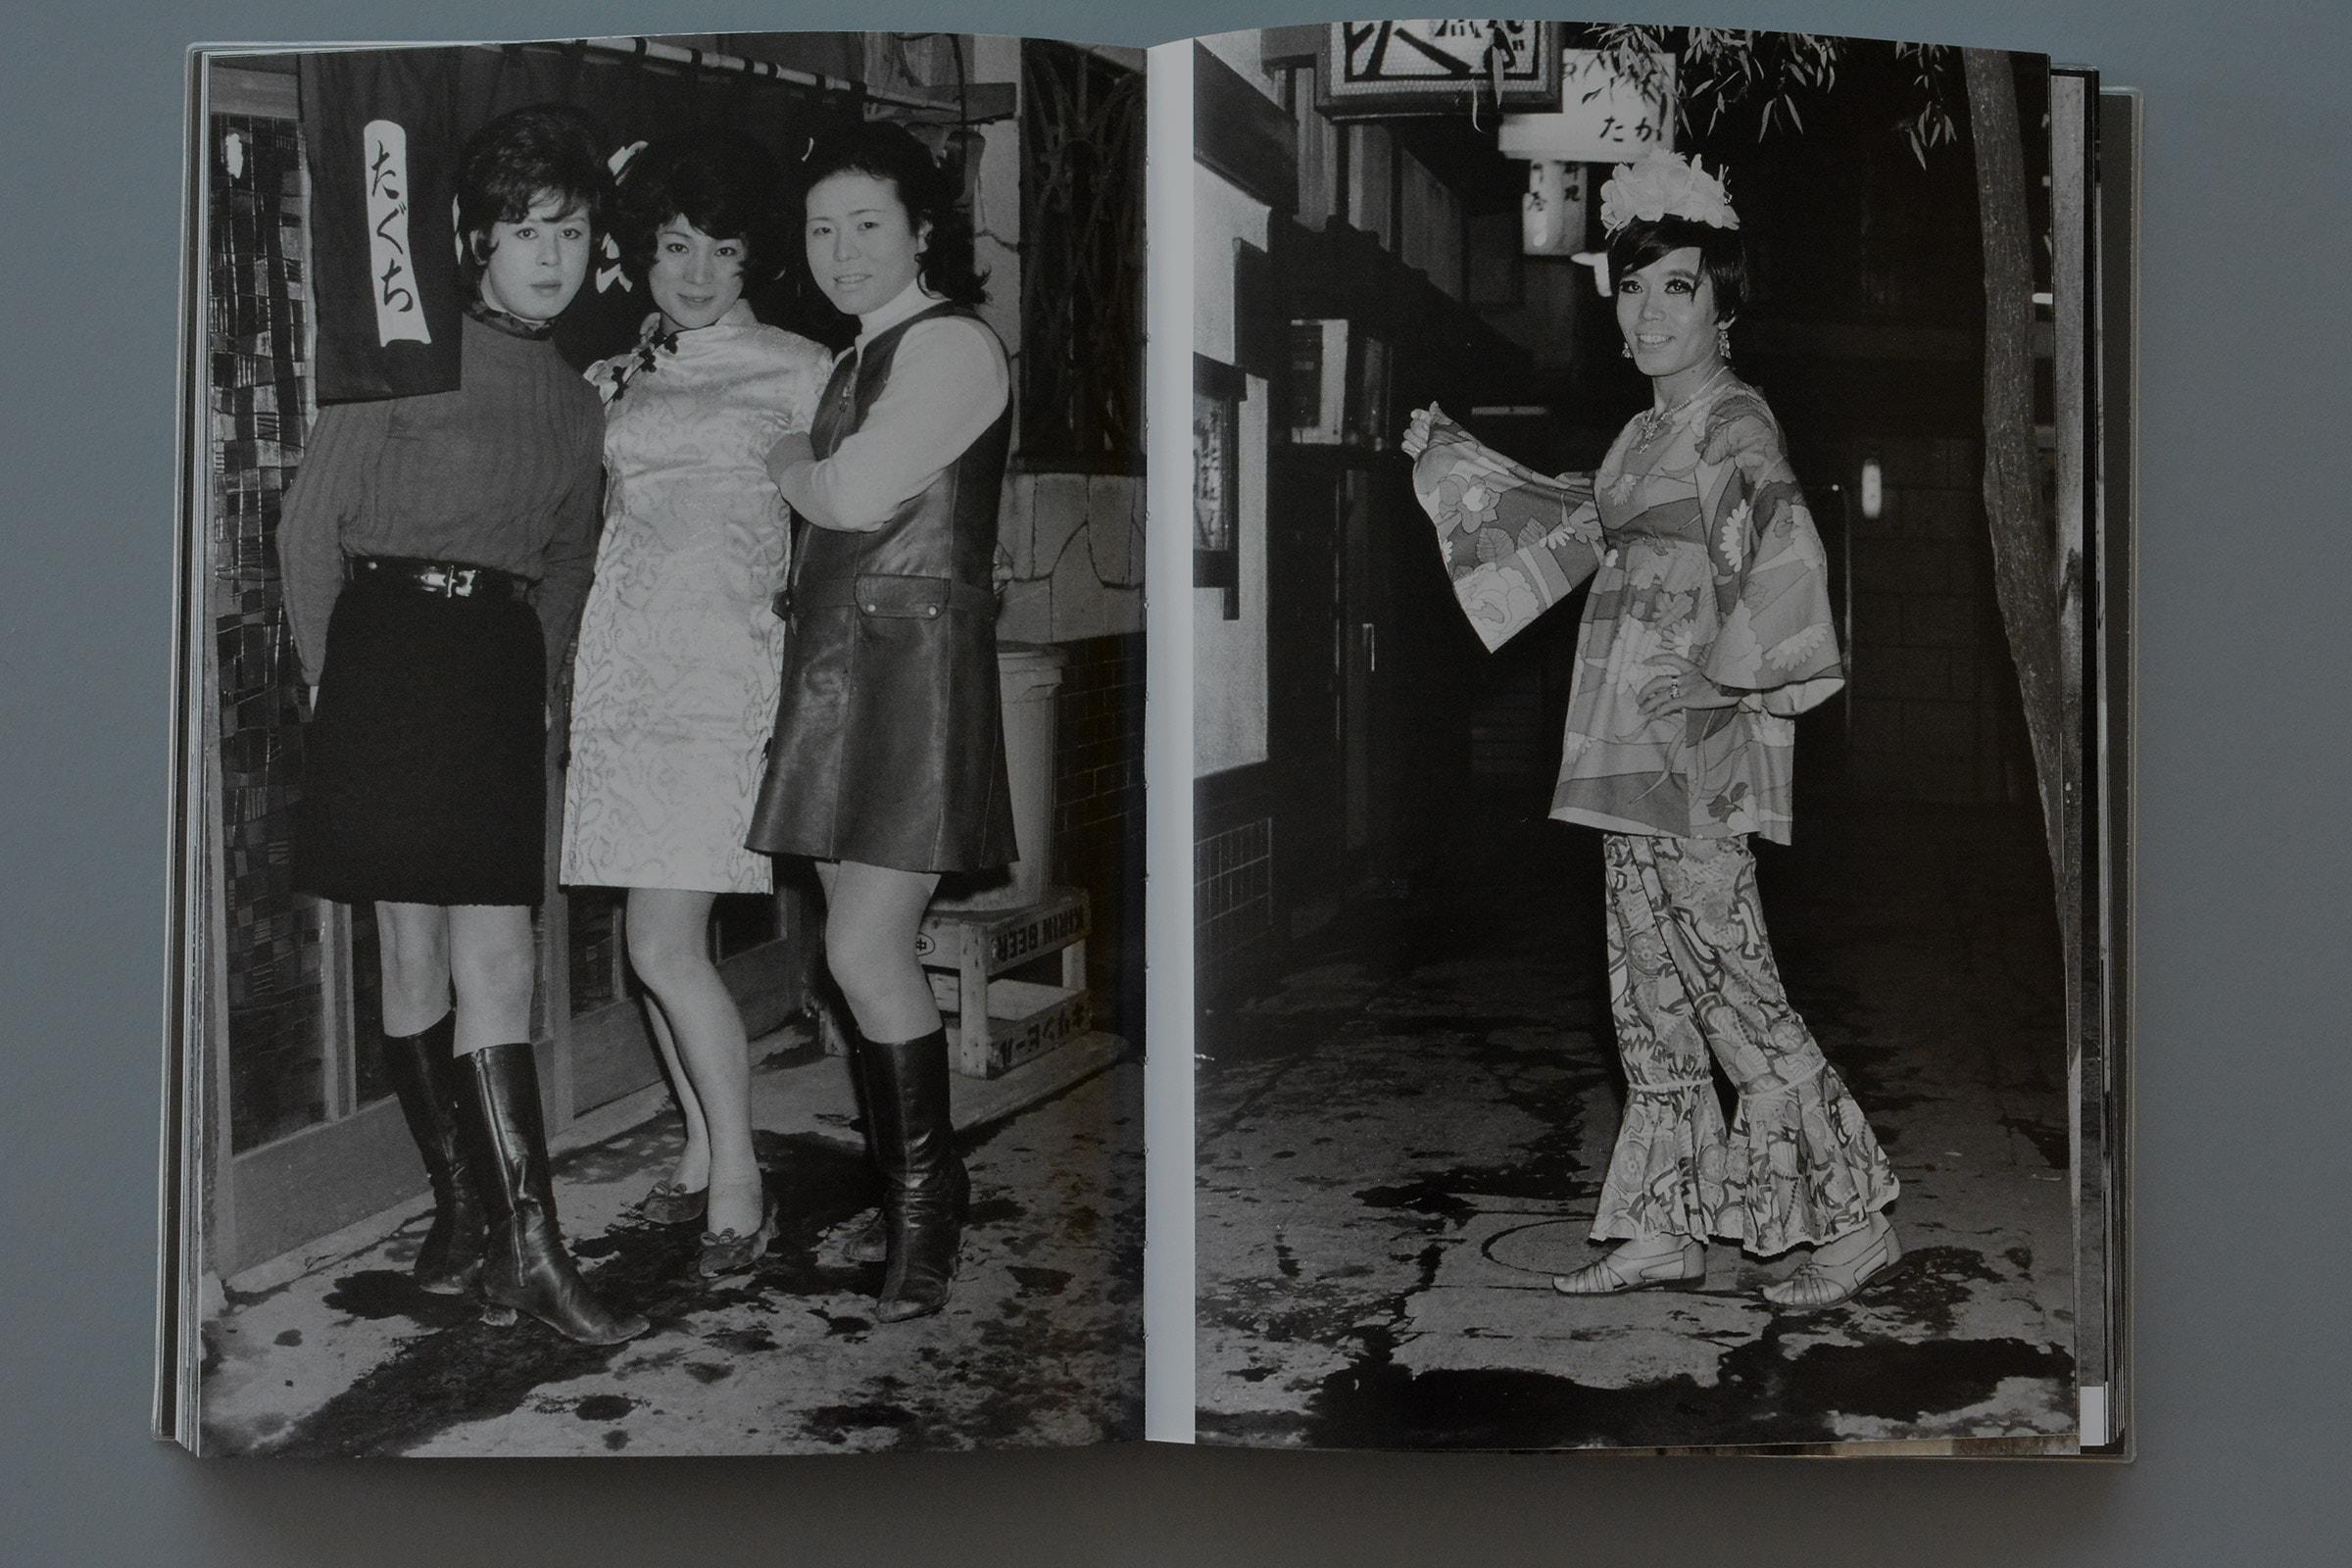 Kabuki-Cho, Siebdruck, Parsons School, The New School, New York